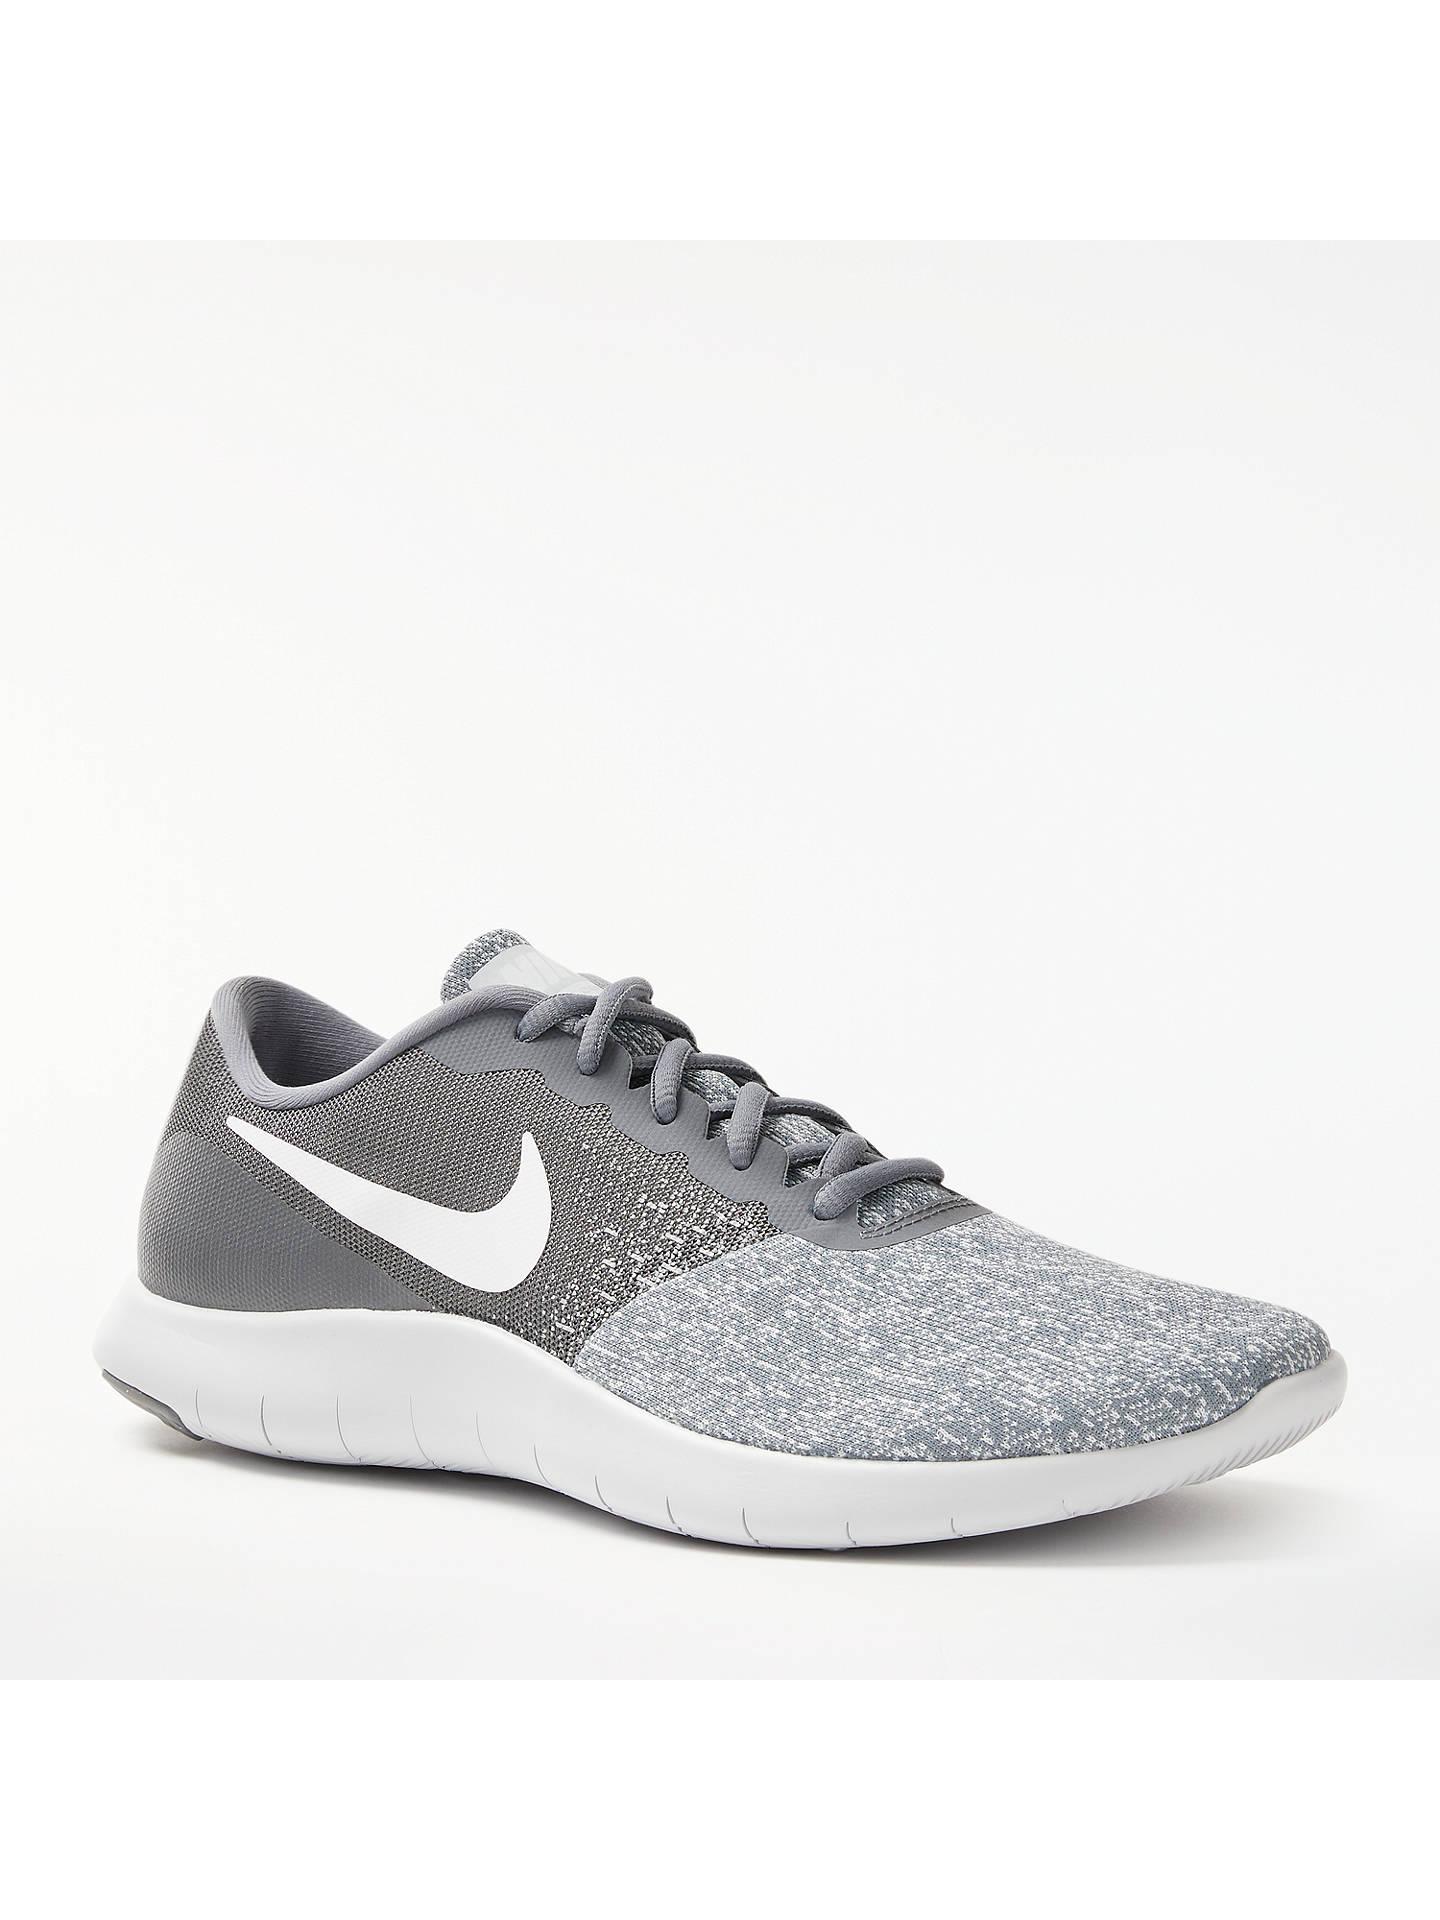 83c6c447b270 Buy Nike s Flex Contact Men s Running Shoe